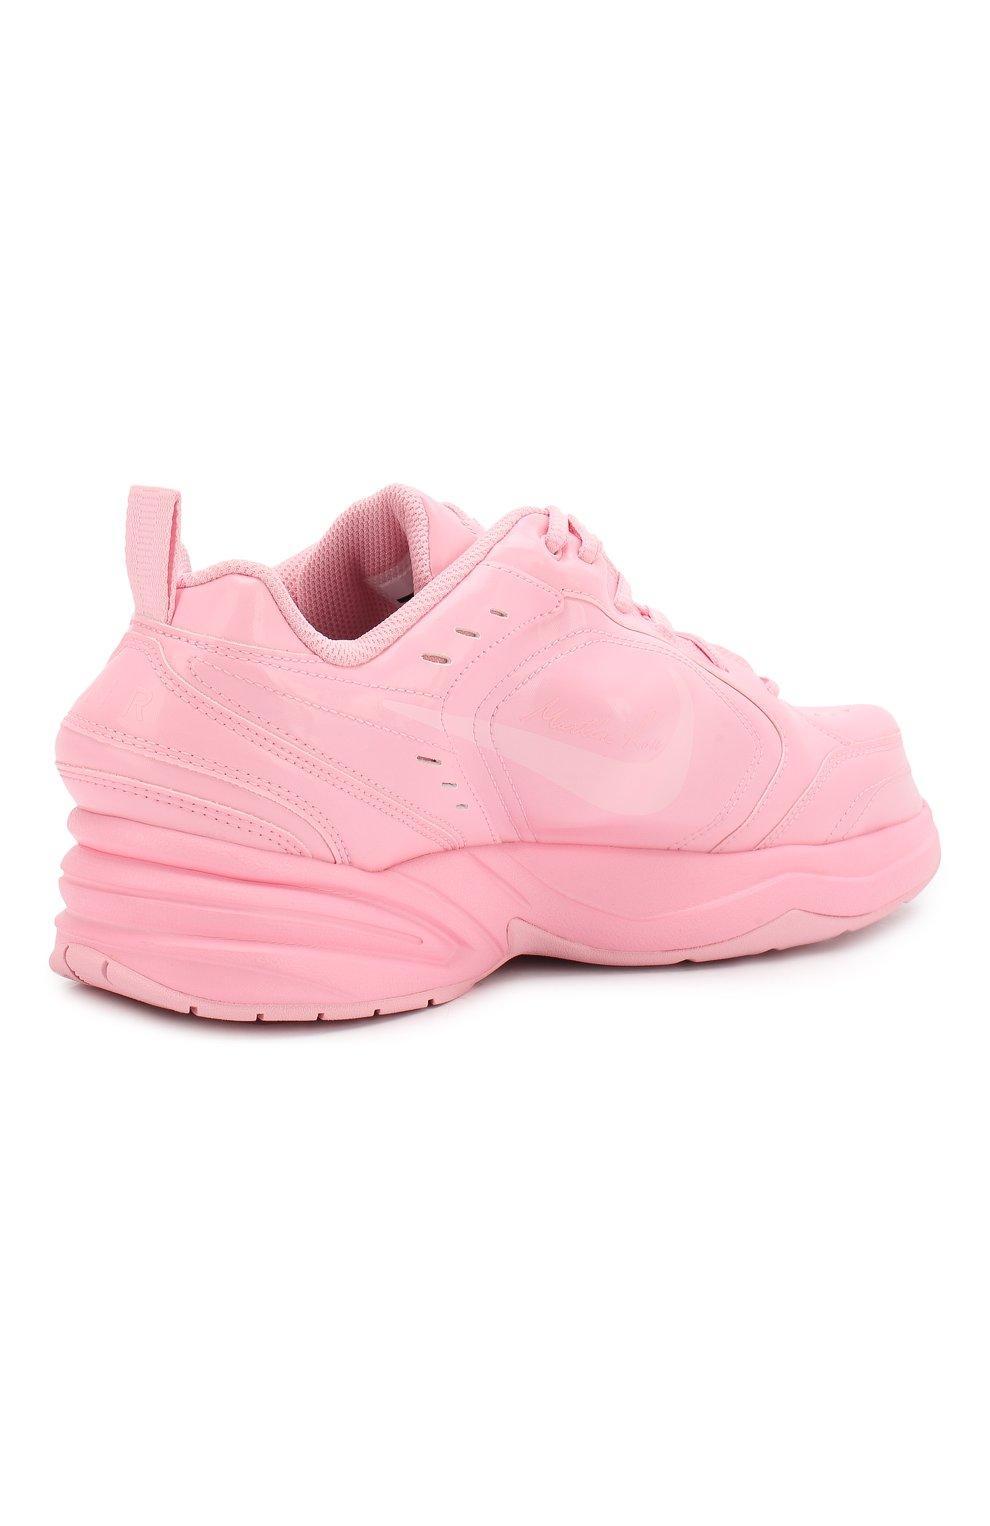 f338a8d60 Кожаные кроссовки NikeLab x Martine Rose Air Monarch IV NikeLab розовые |  Фото №4